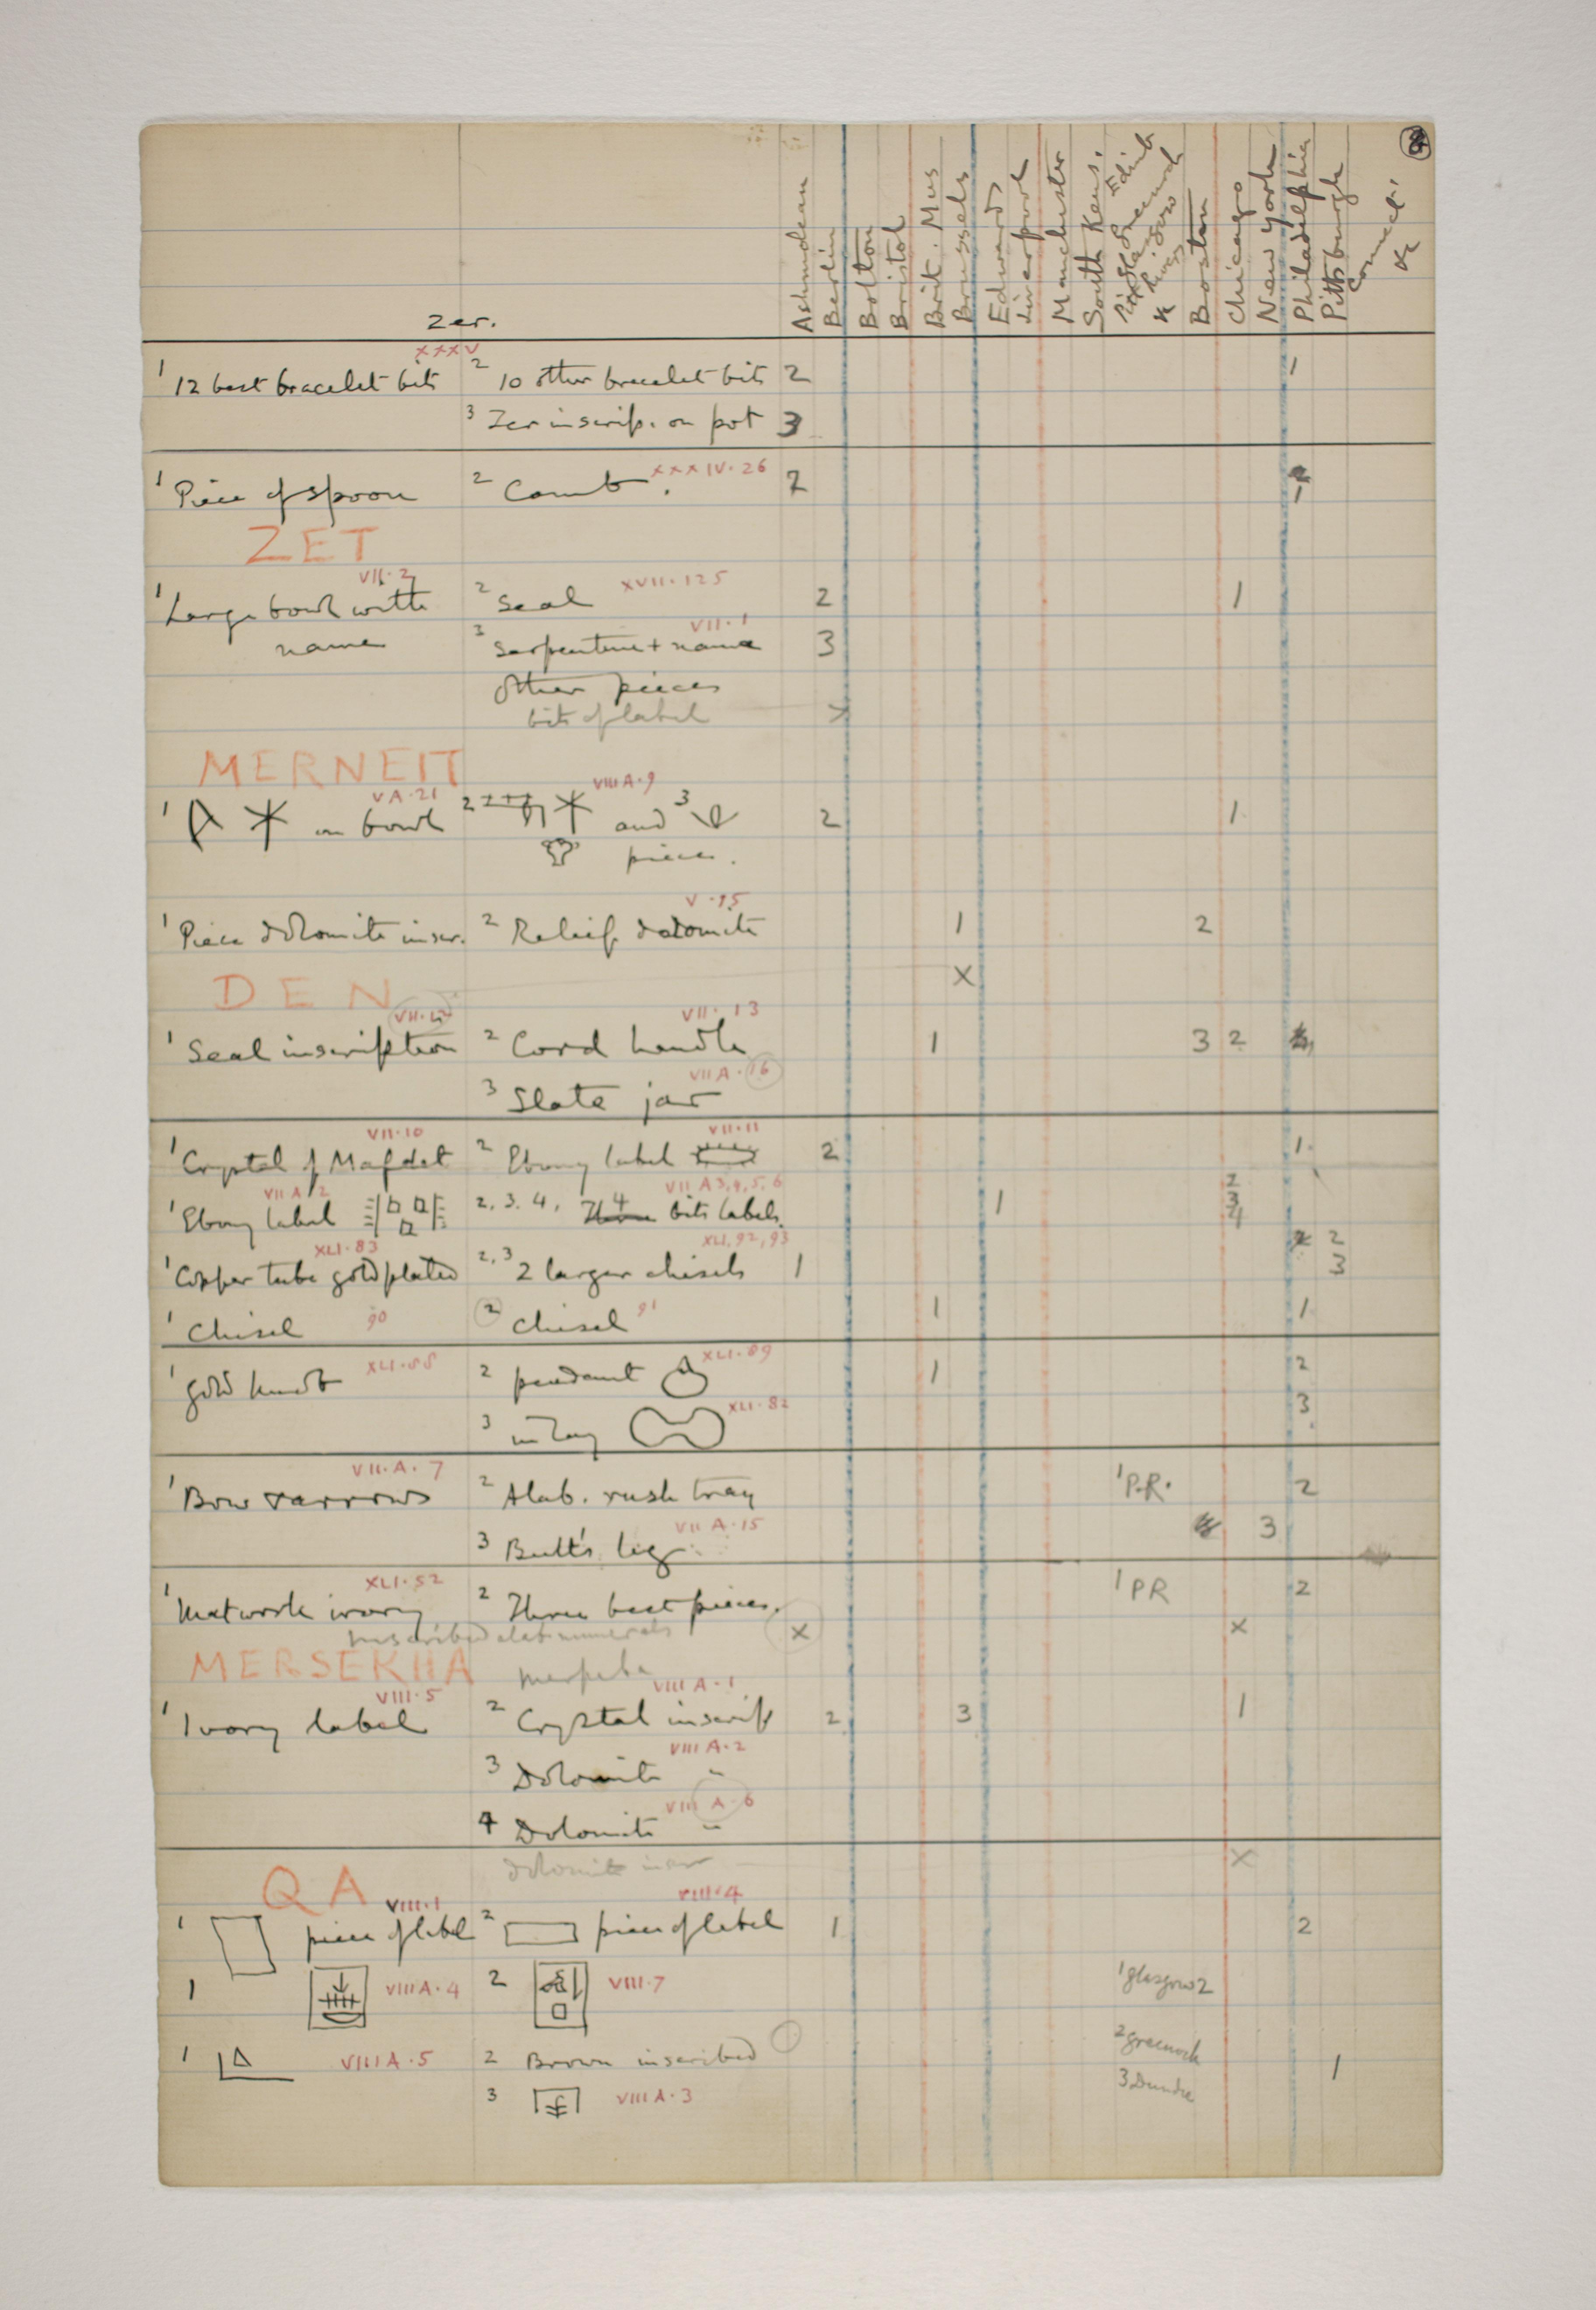 1900-01 Abydos, Bet Khallaf, el-Mahasna Distribution grid PMA/WFP1/D/9/8